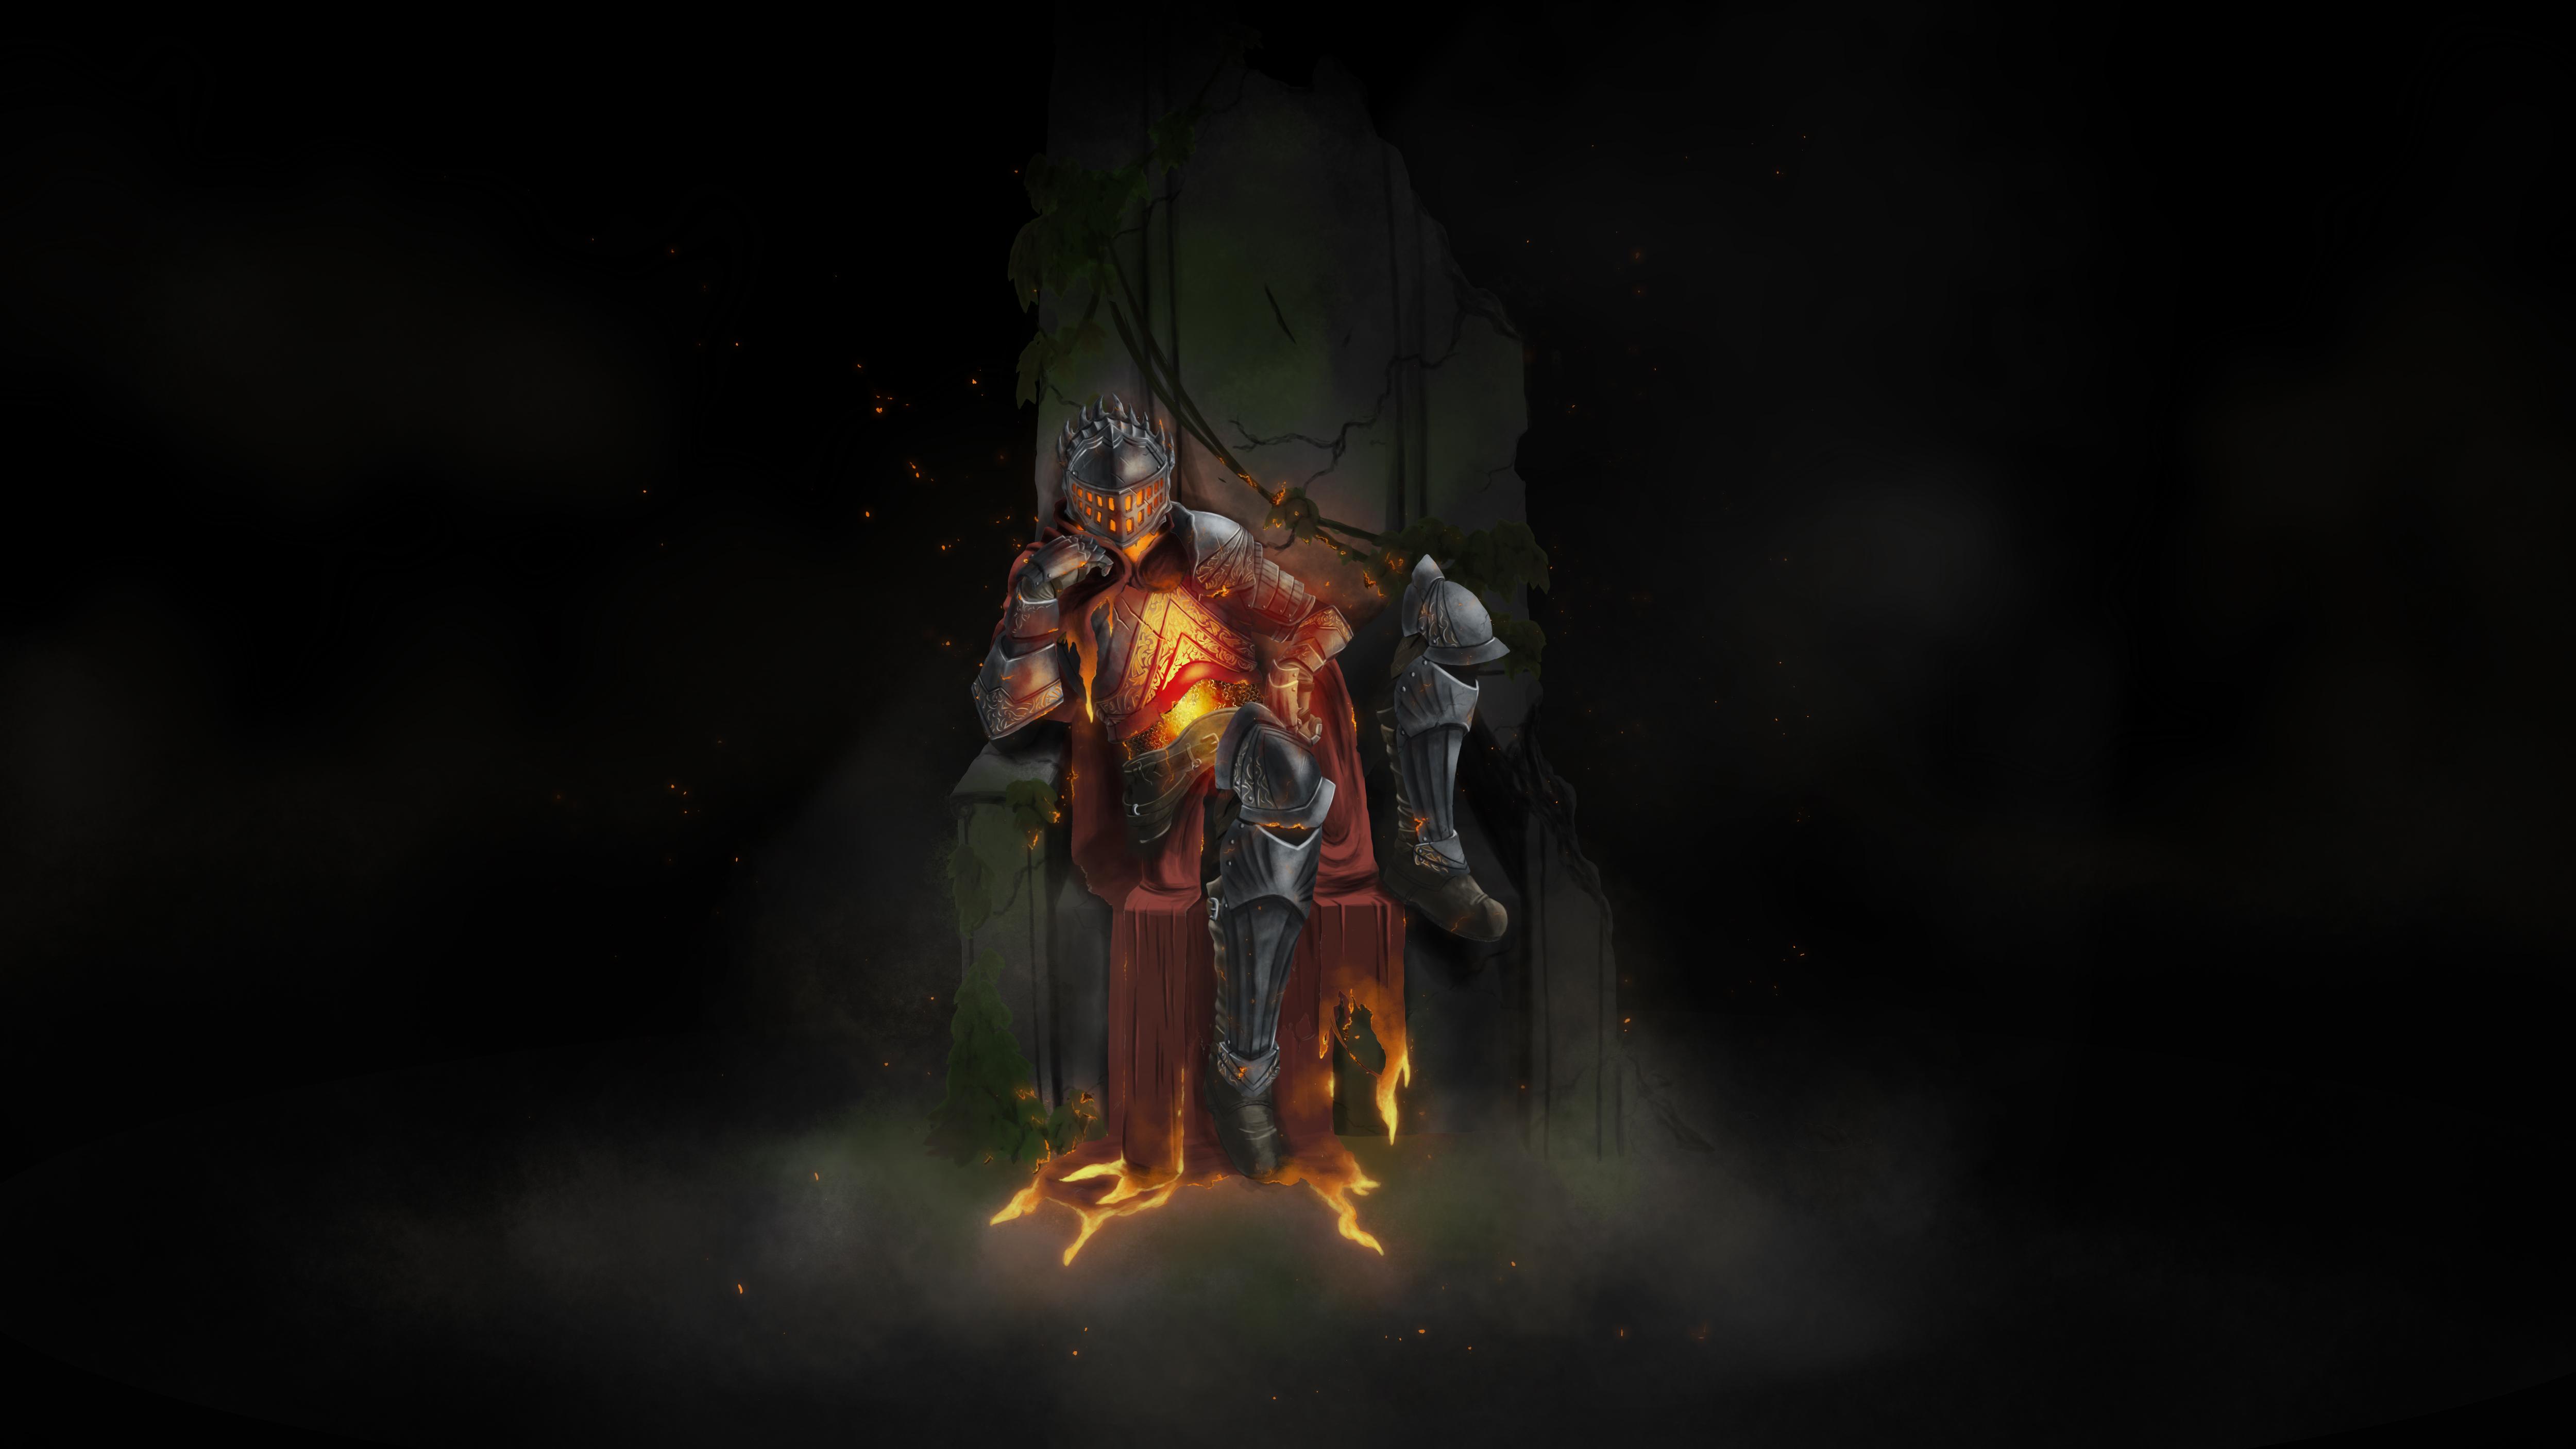 Dark Souls Iii Lord Of Cinder 4k Ultra Hd Wallpaper